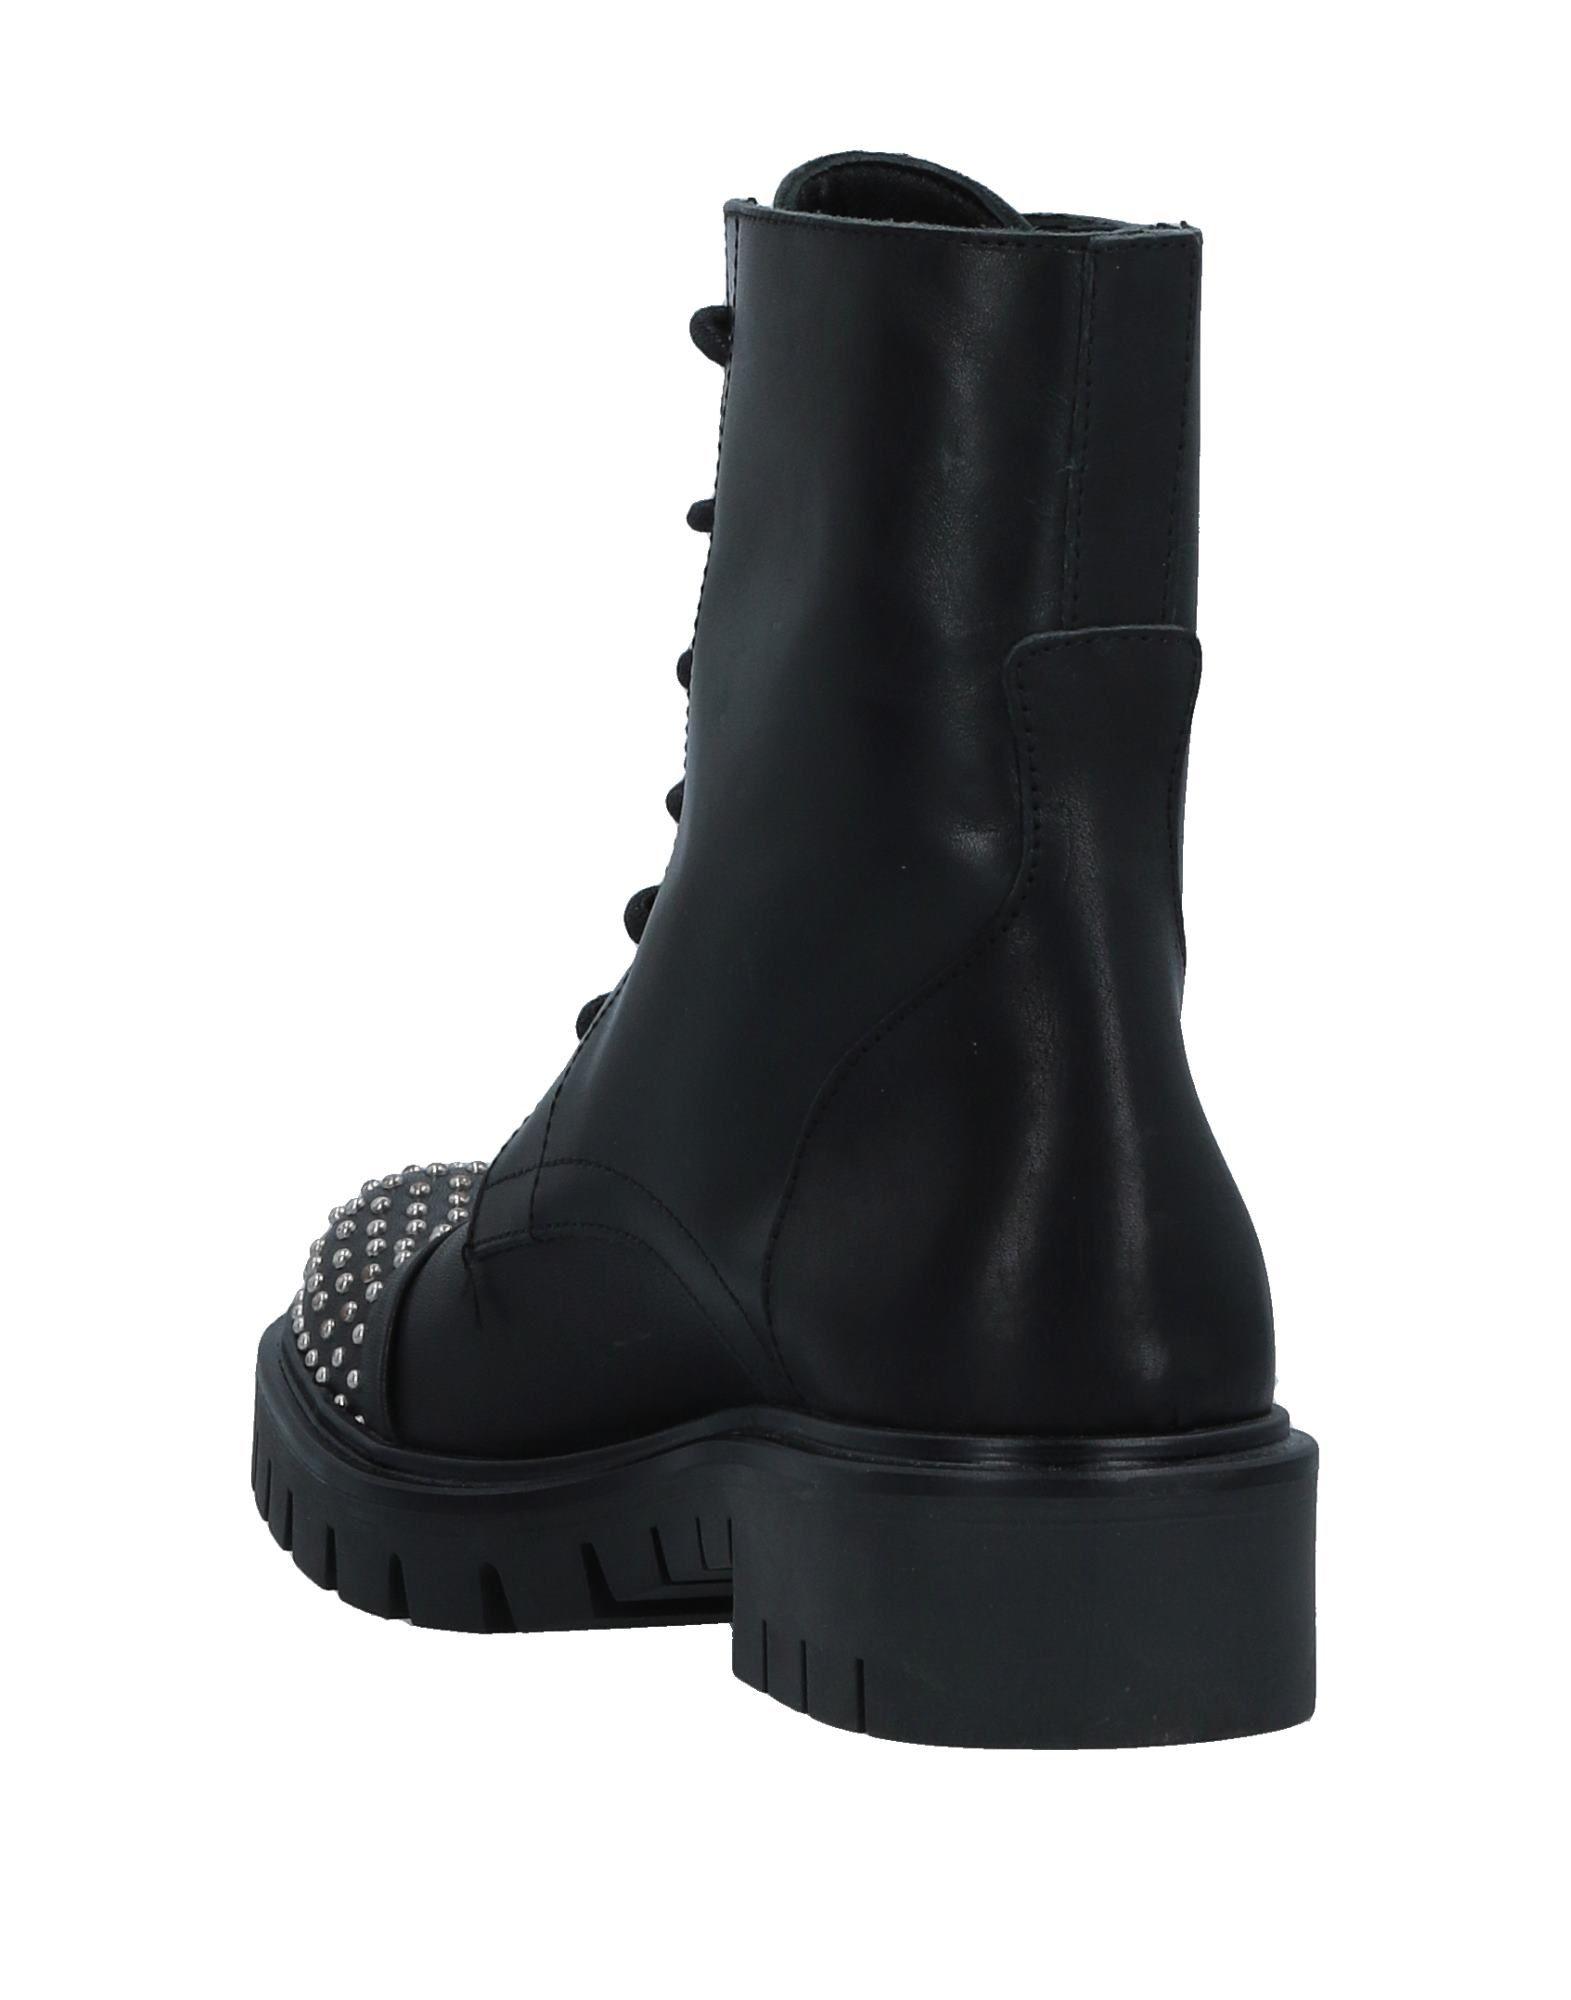 Unlace Stiefelette Damen  11524328LB Gute Qualität beliebte Schuhe